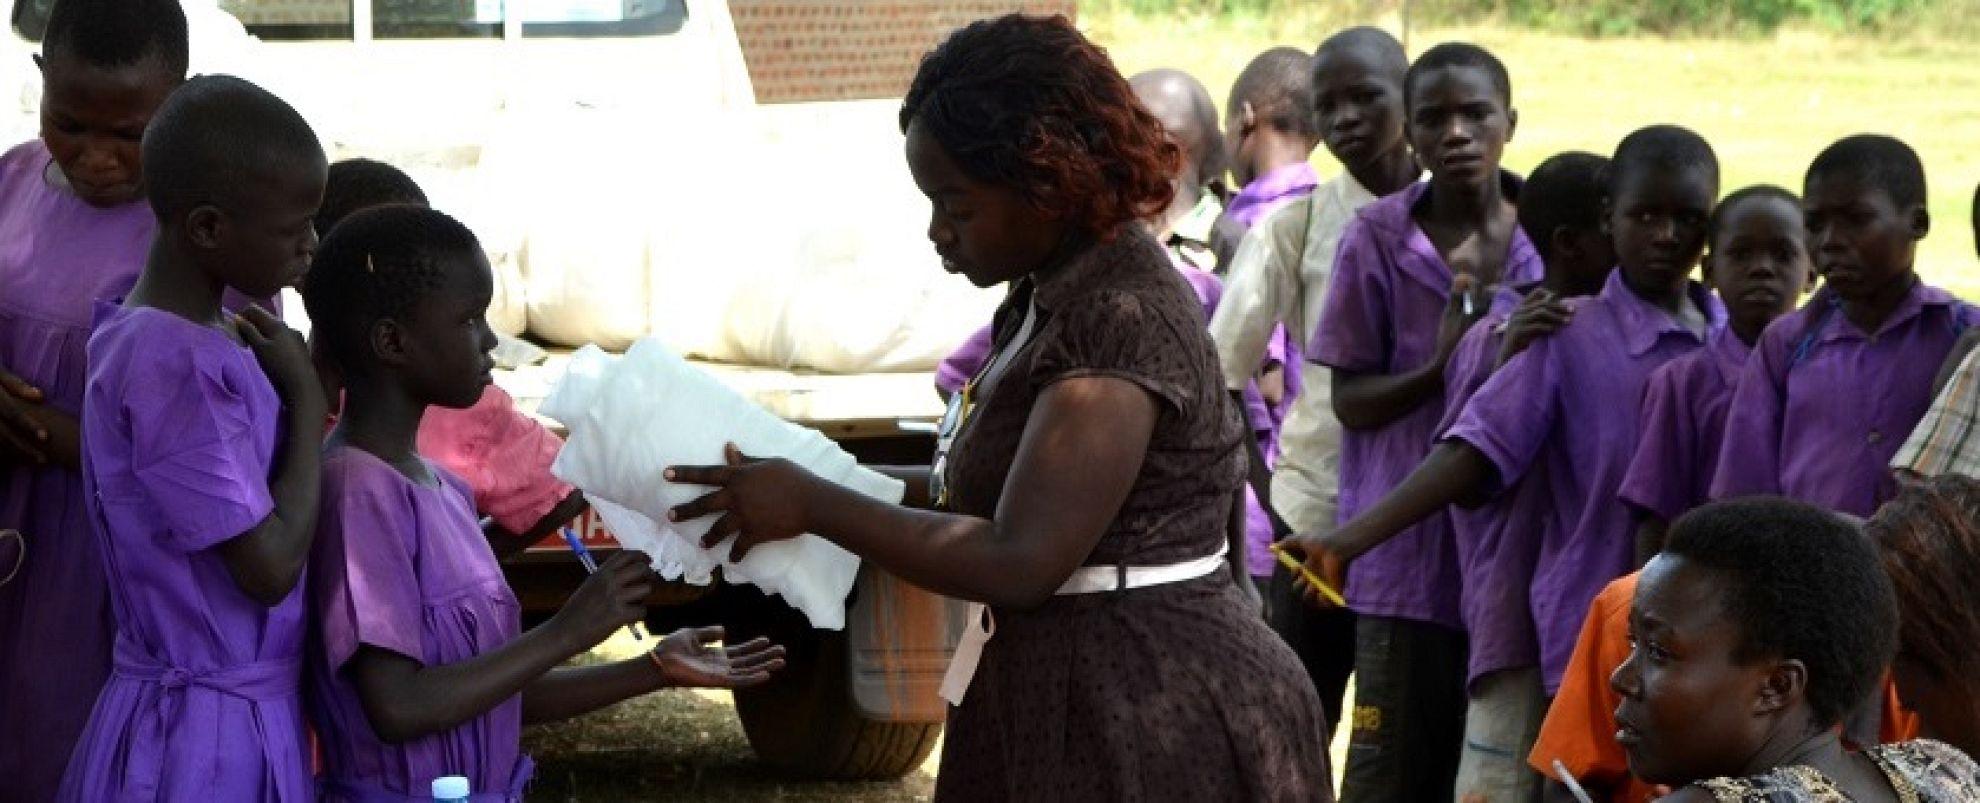 Latest News Bbc interviews dr james tibenderana on progress against malaria mdg target